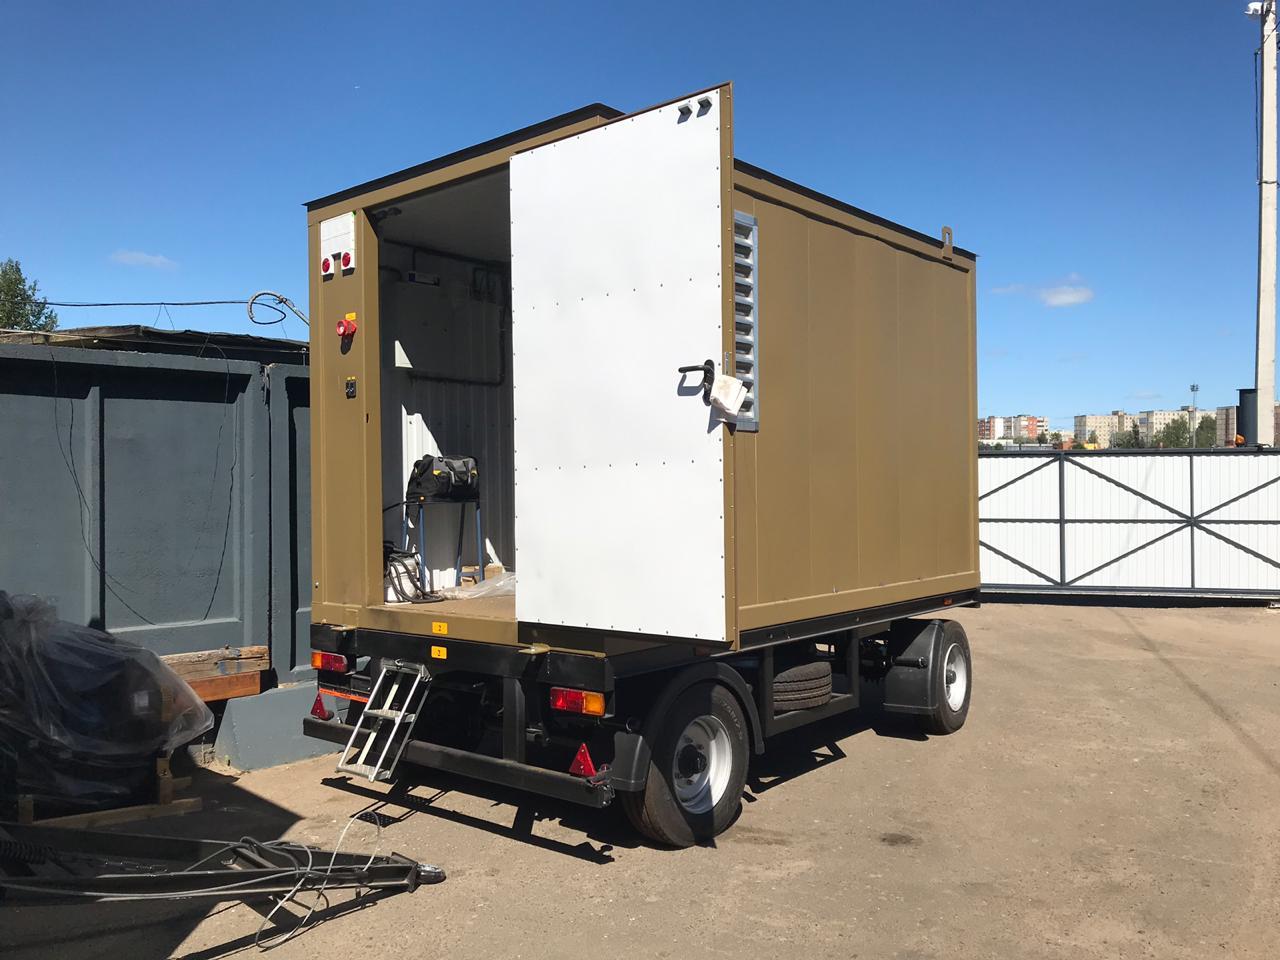 ЭД275-Т400-1РН (в контейнере на шасси)